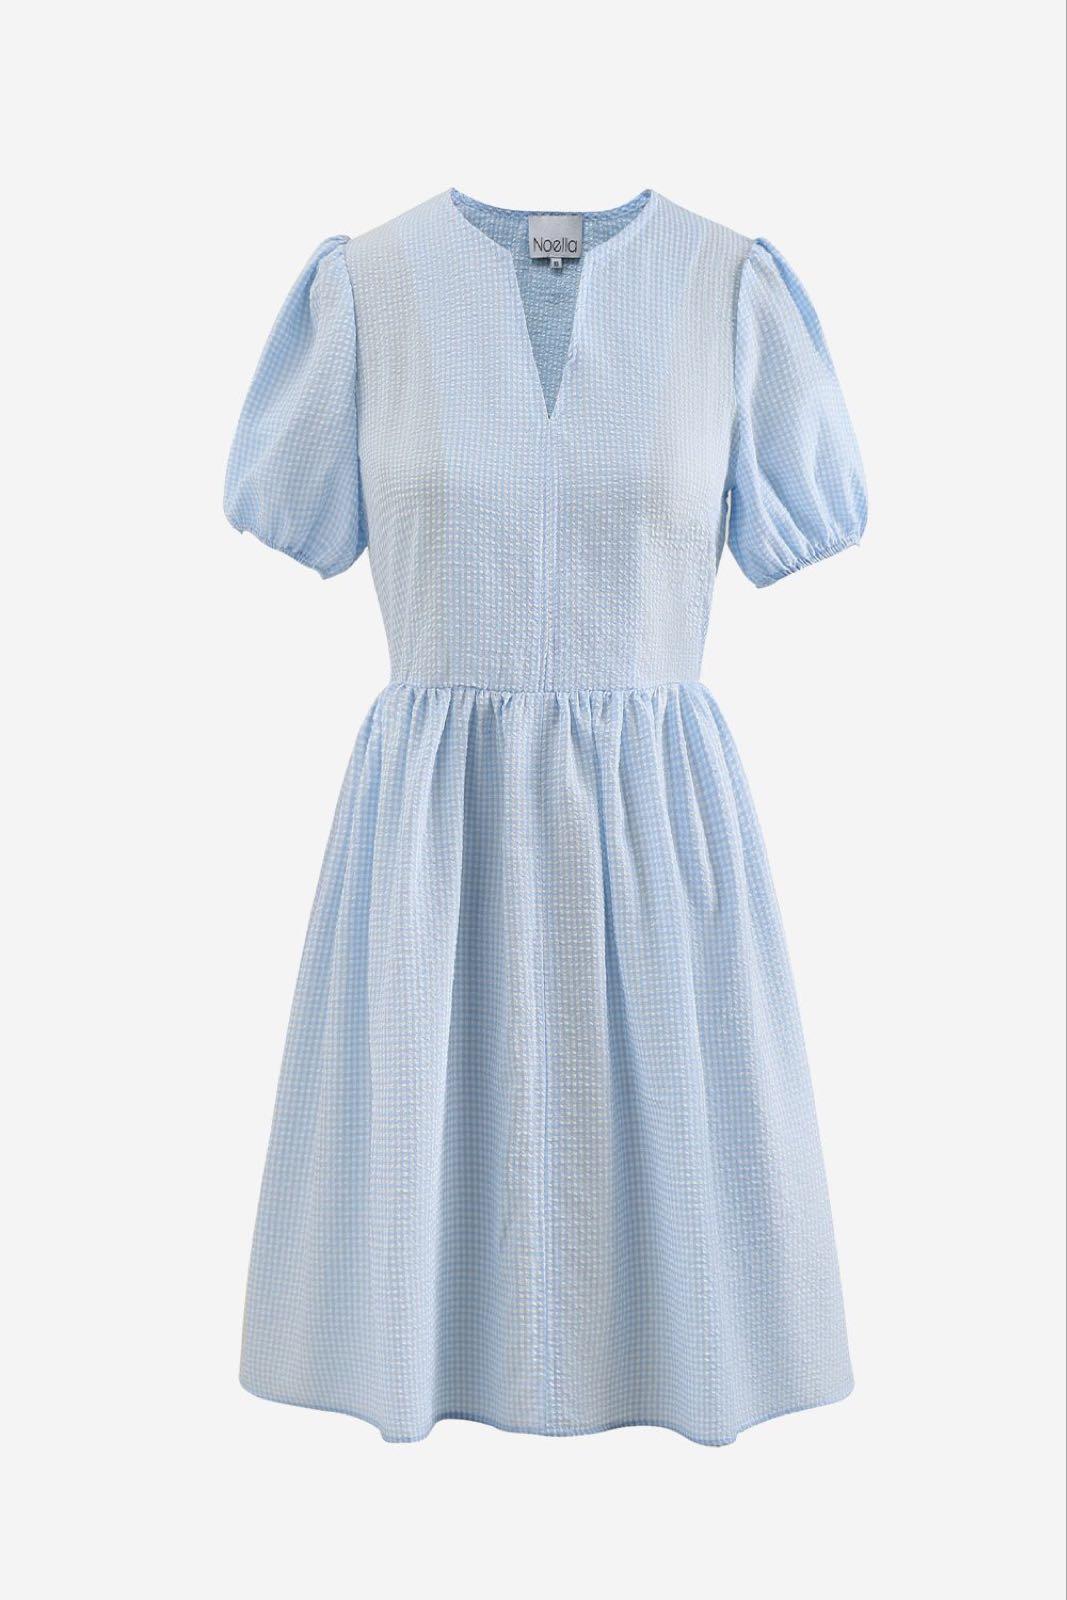 Cora kjole Noella